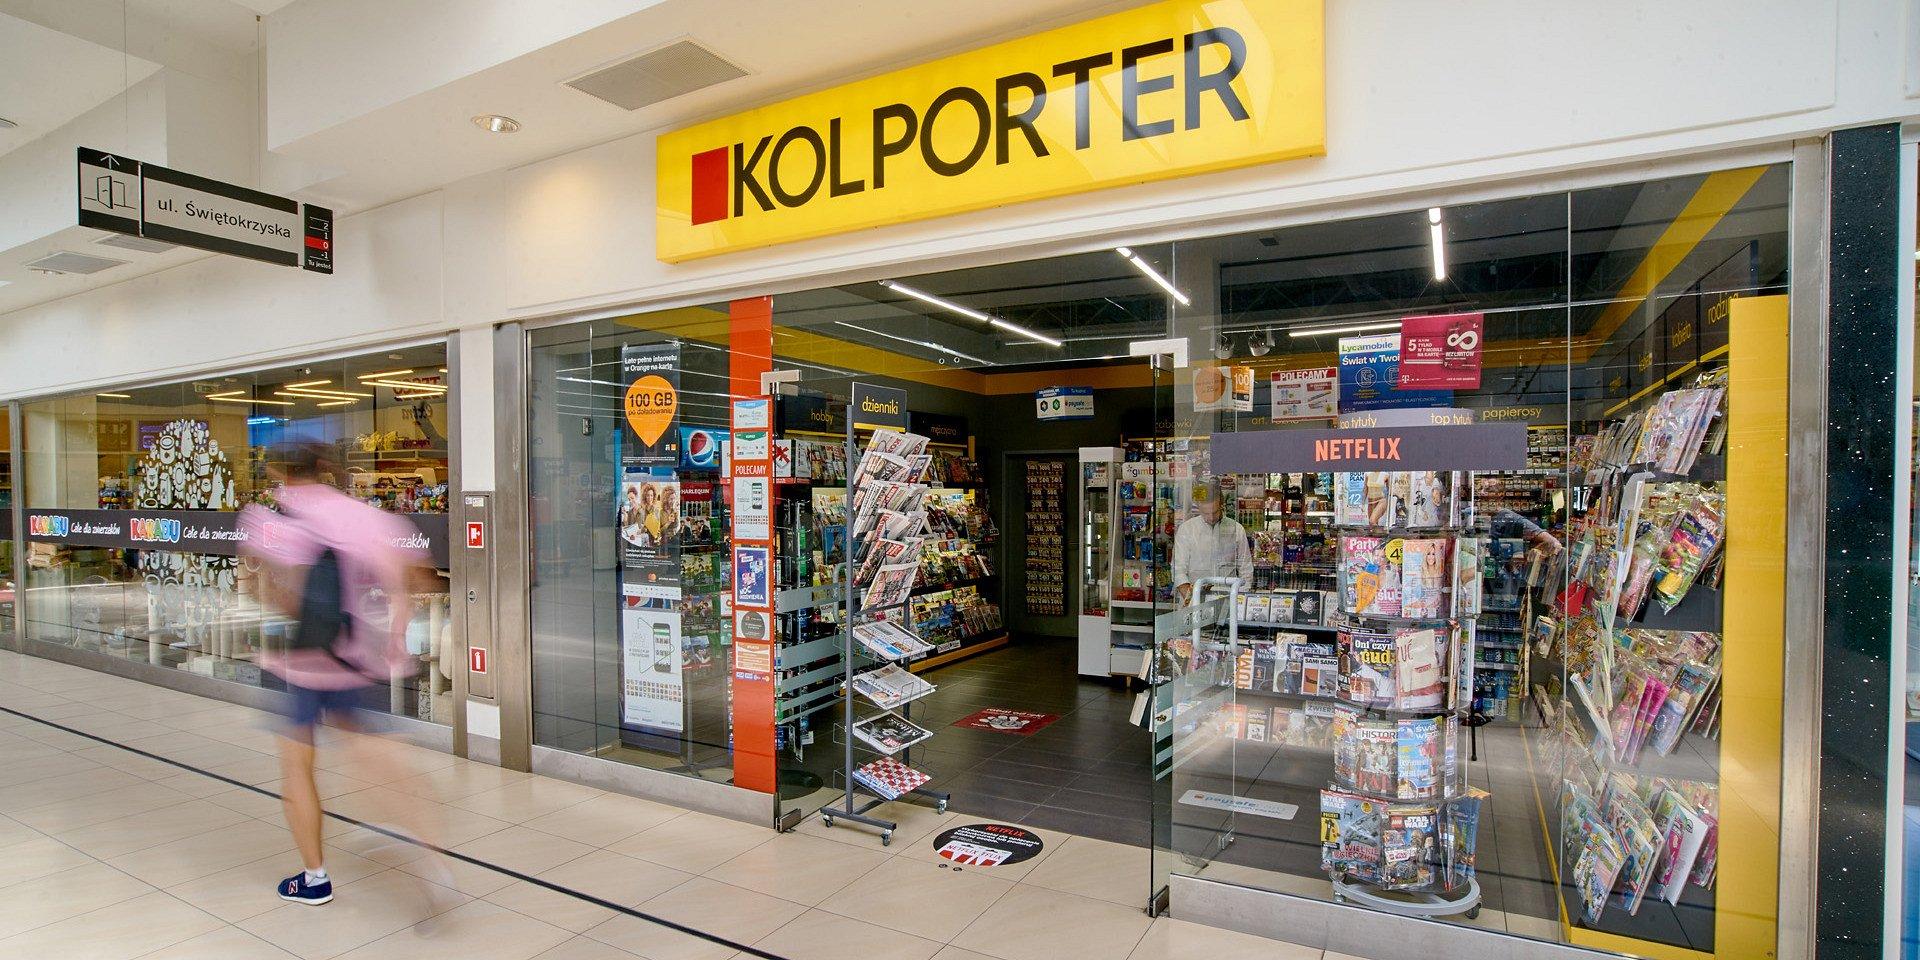 Saloniki Kolportera z rosnącą sprzedażą